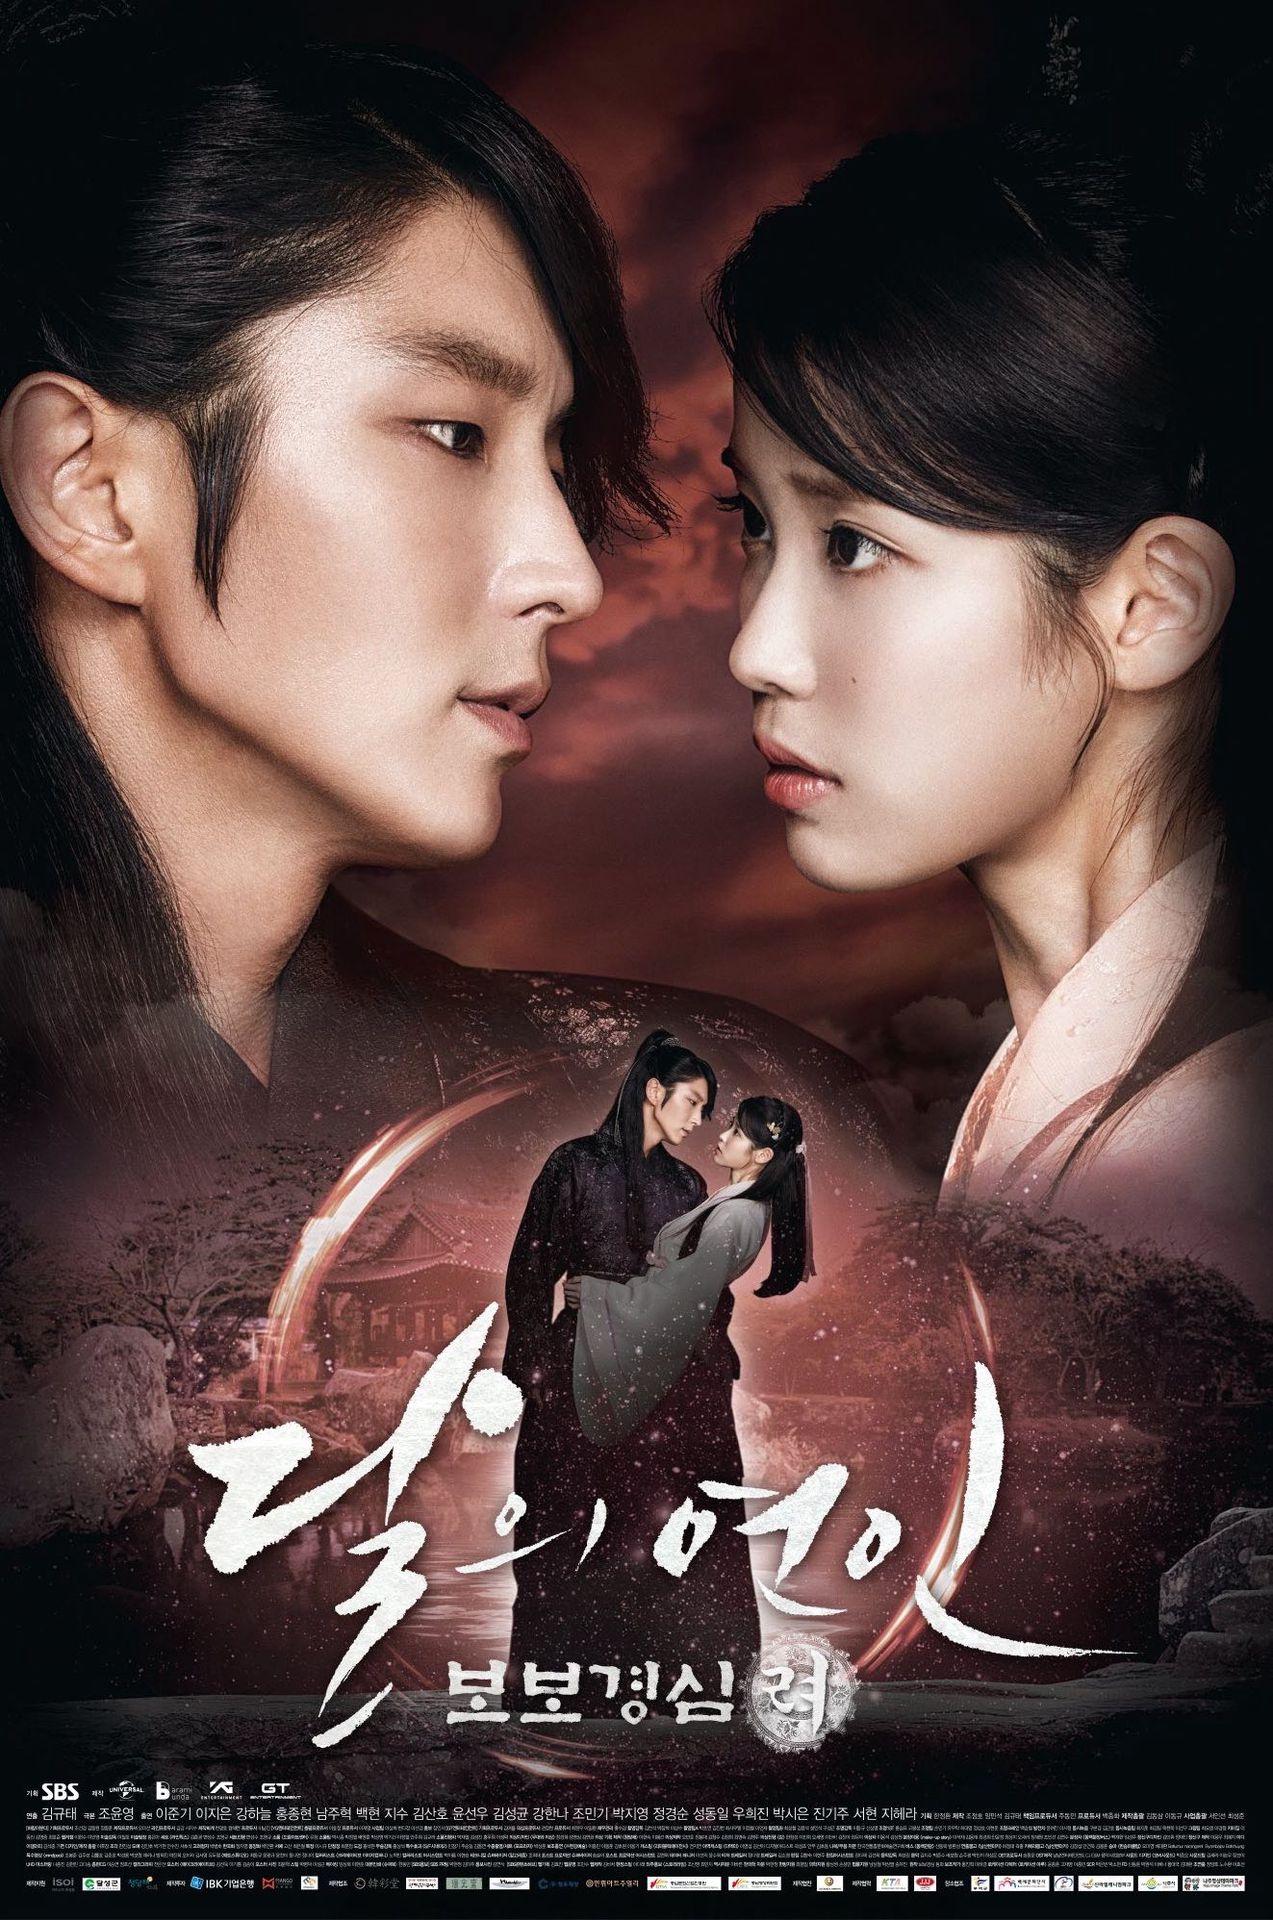 Best Korean Dramas to Watch - Moon Lovers: Scarlet Heart